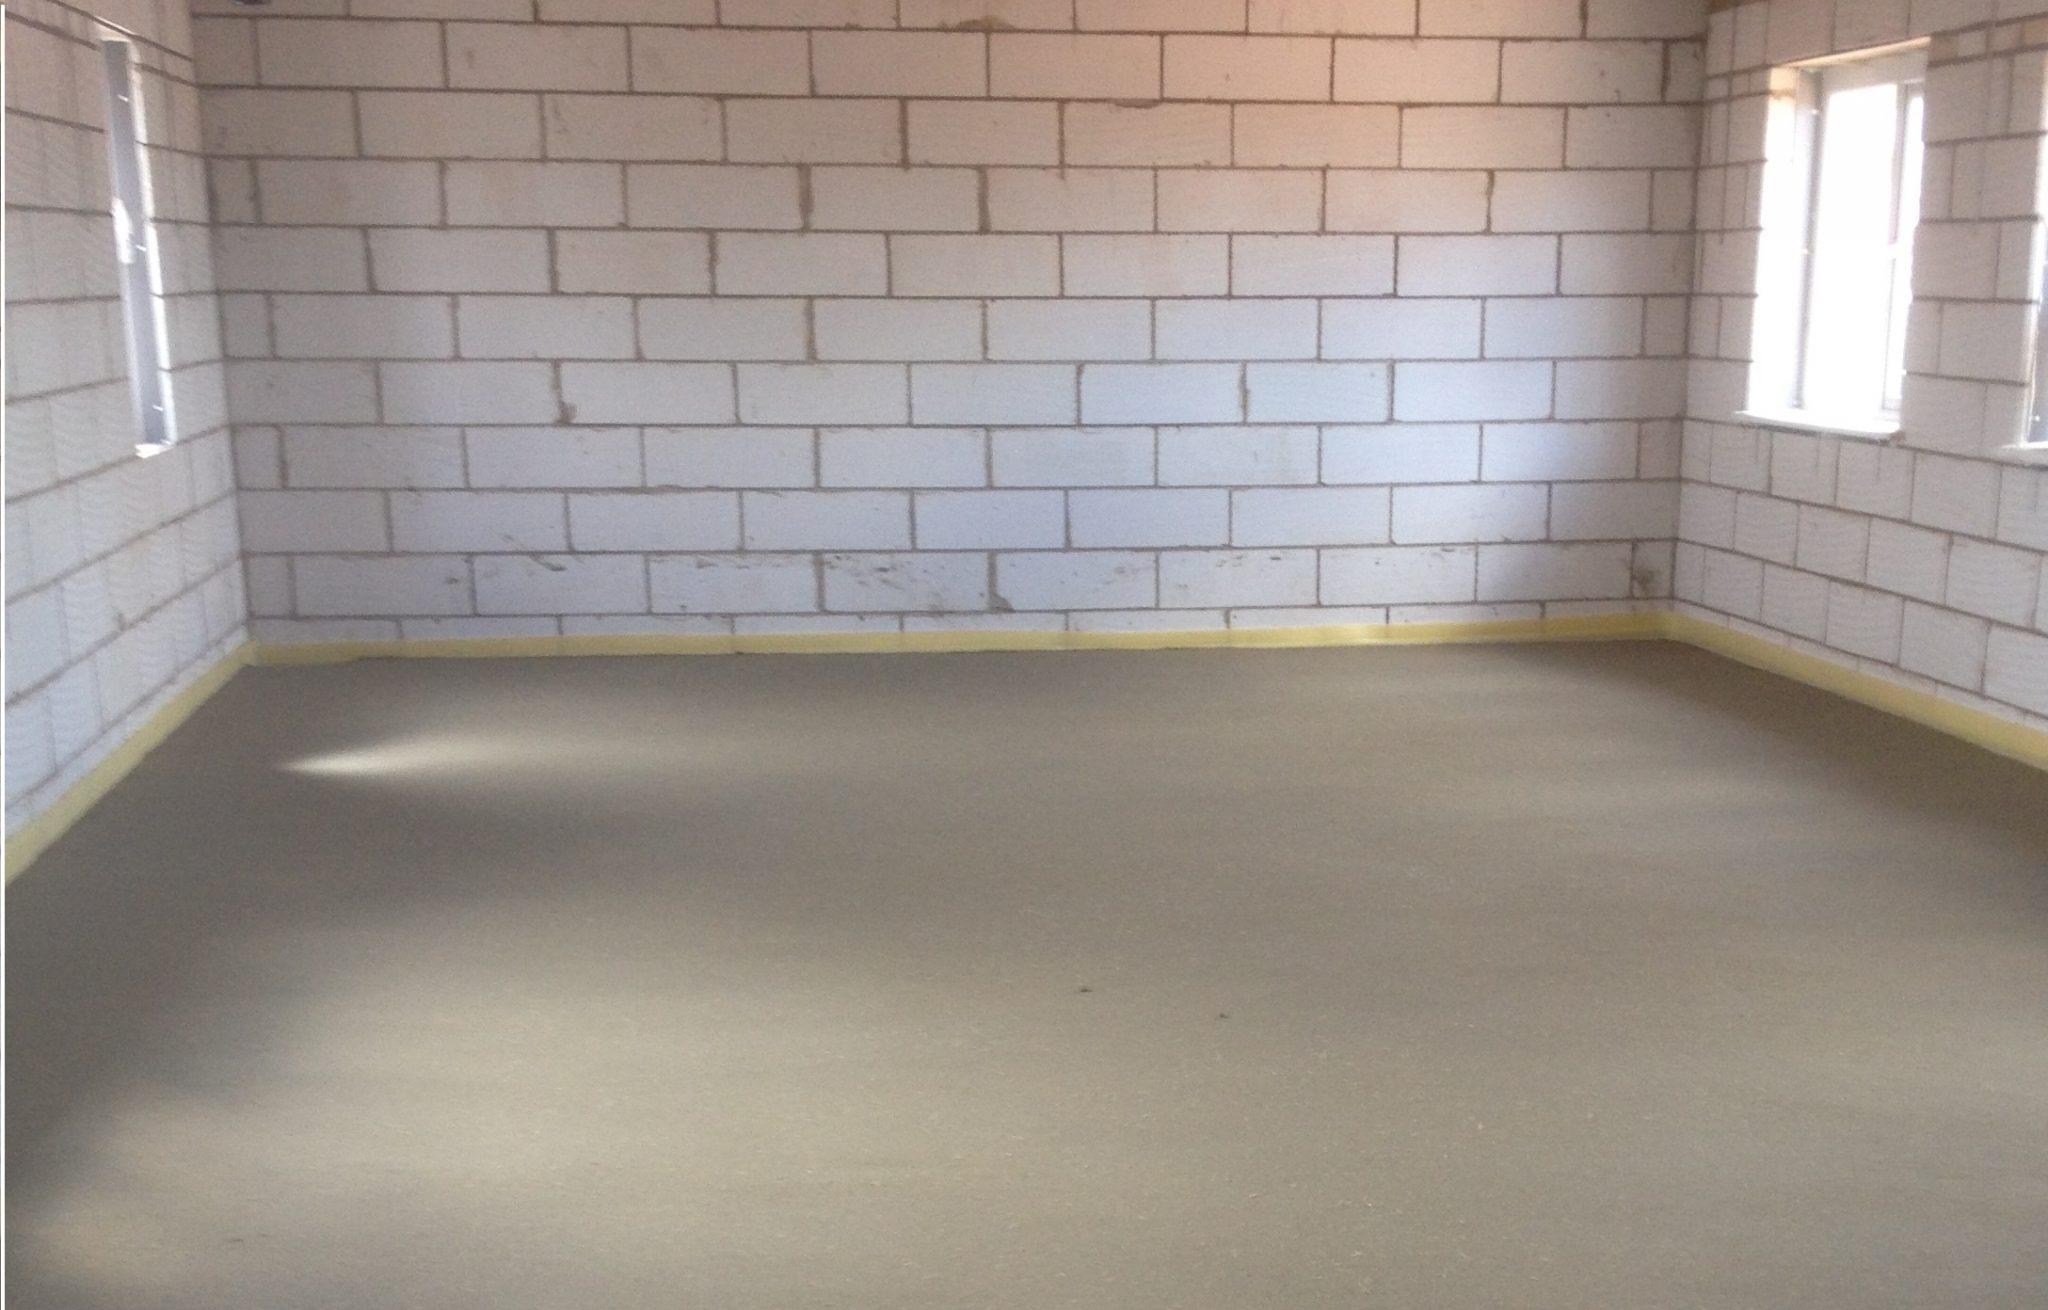 Northants Internal Floor Screed Concrete Kettering Wellingborough Milton Keynes Corby Bedford